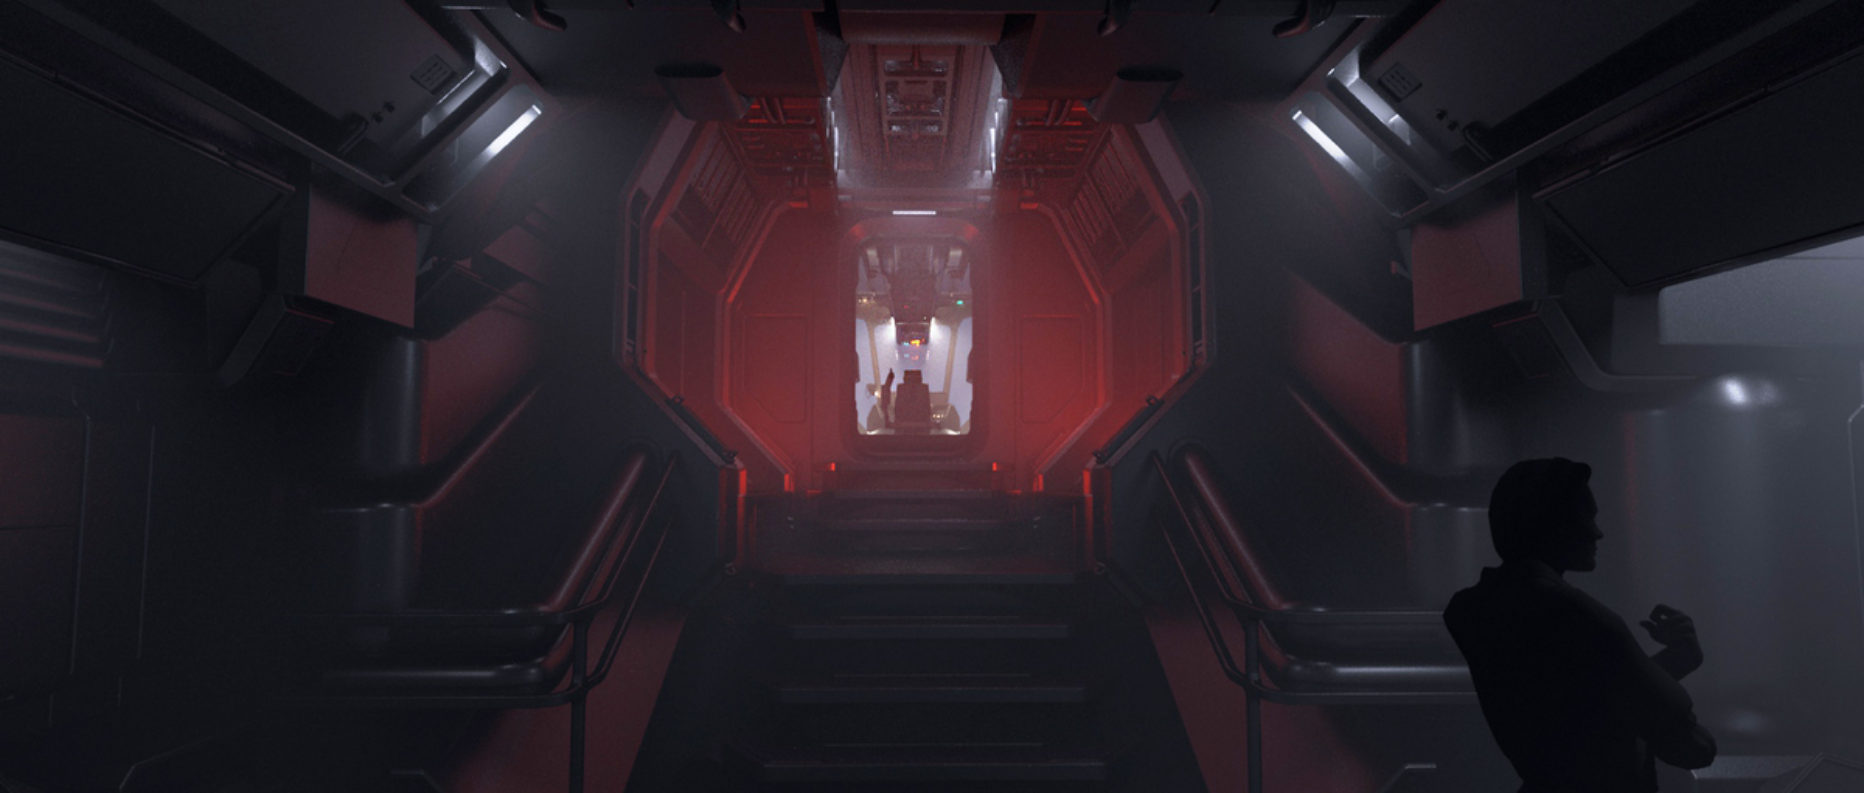 SC-Aegis-Vulcan-2-4.jpg